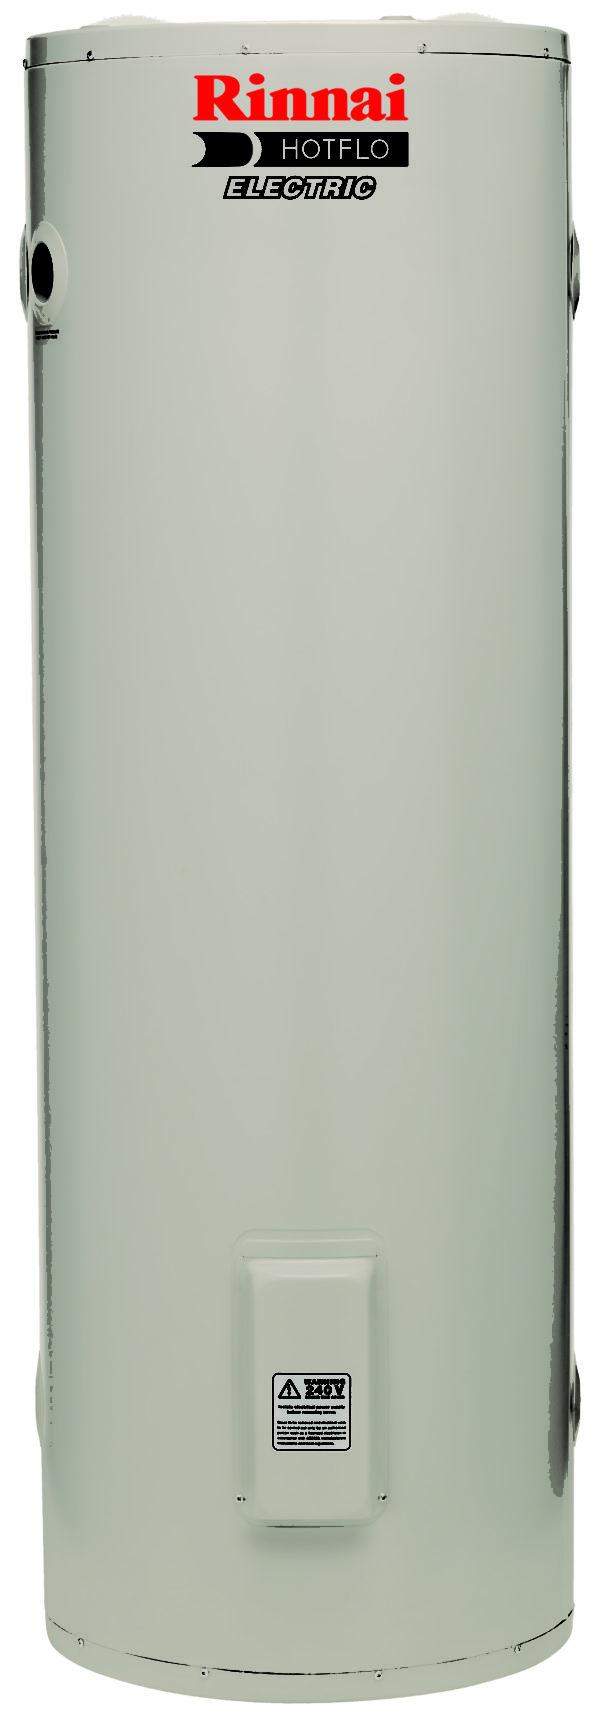 160L Rinnai Electric Hotflo Twin element heater